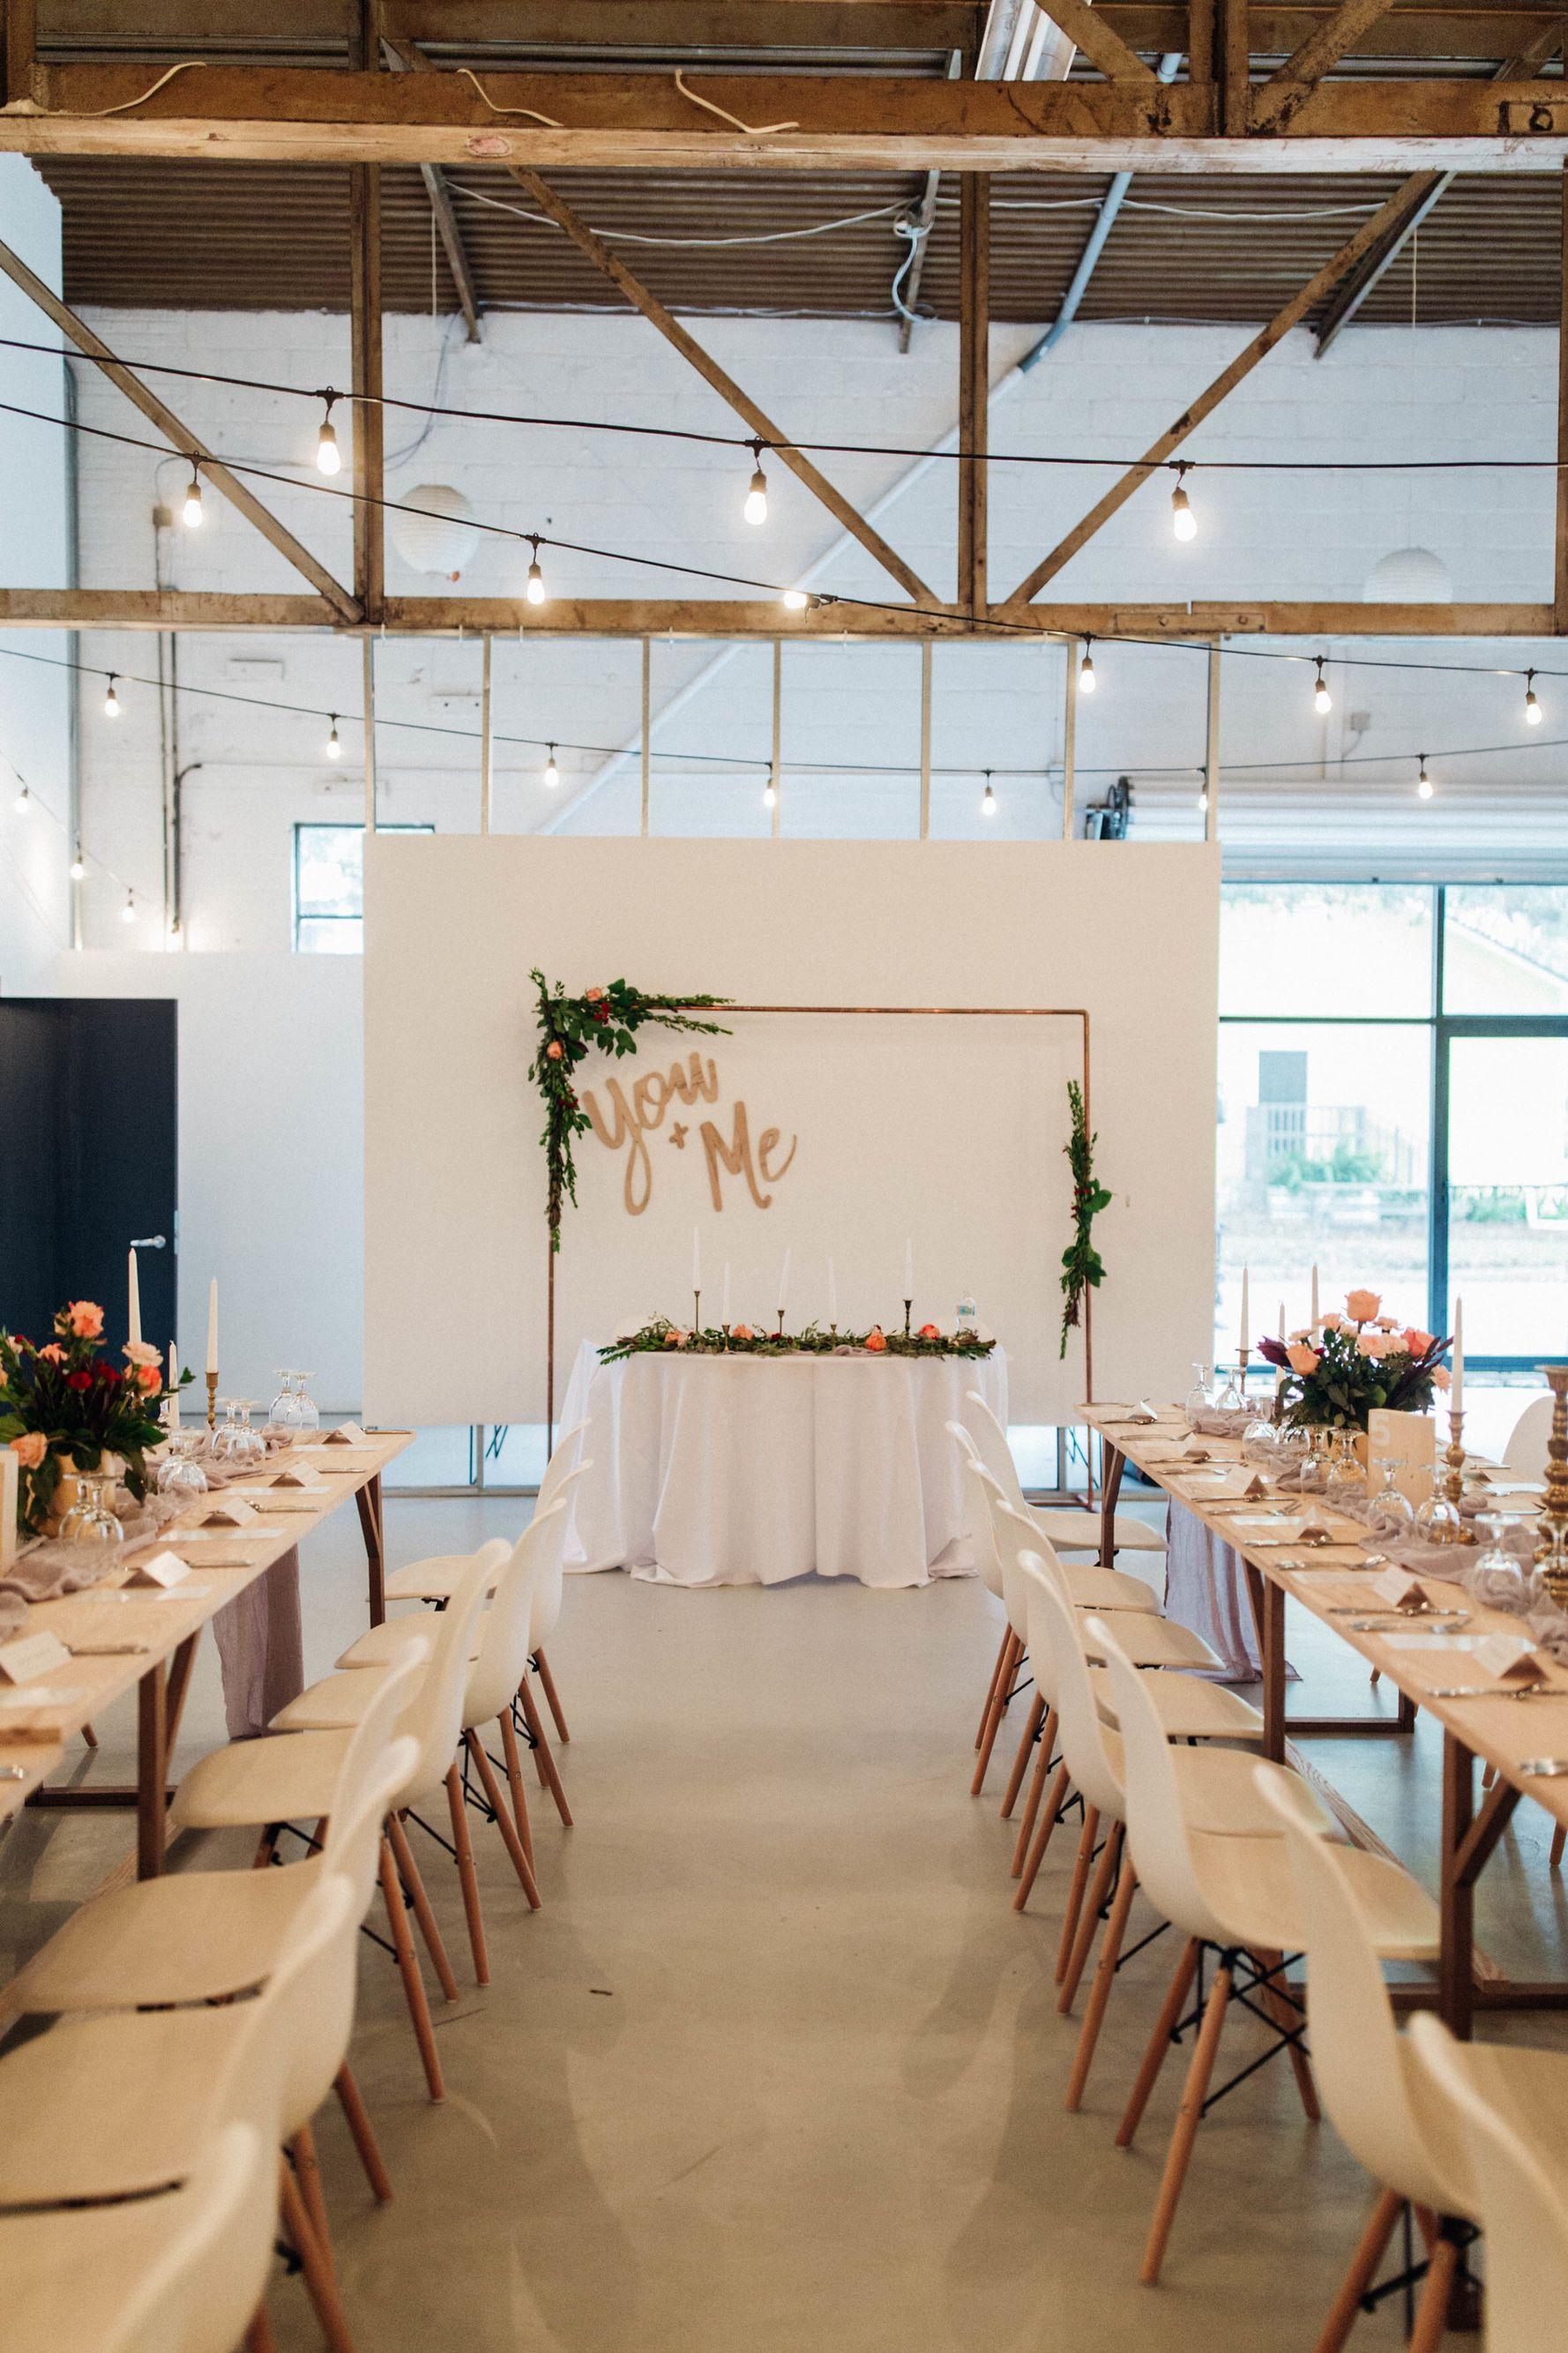 Modern Wedding Venue Six Hundred King Jacksonville Fl Industrial Warehouse Photo By Christina Karst Photogr Modern Wedding Venue Space Wedding Venues